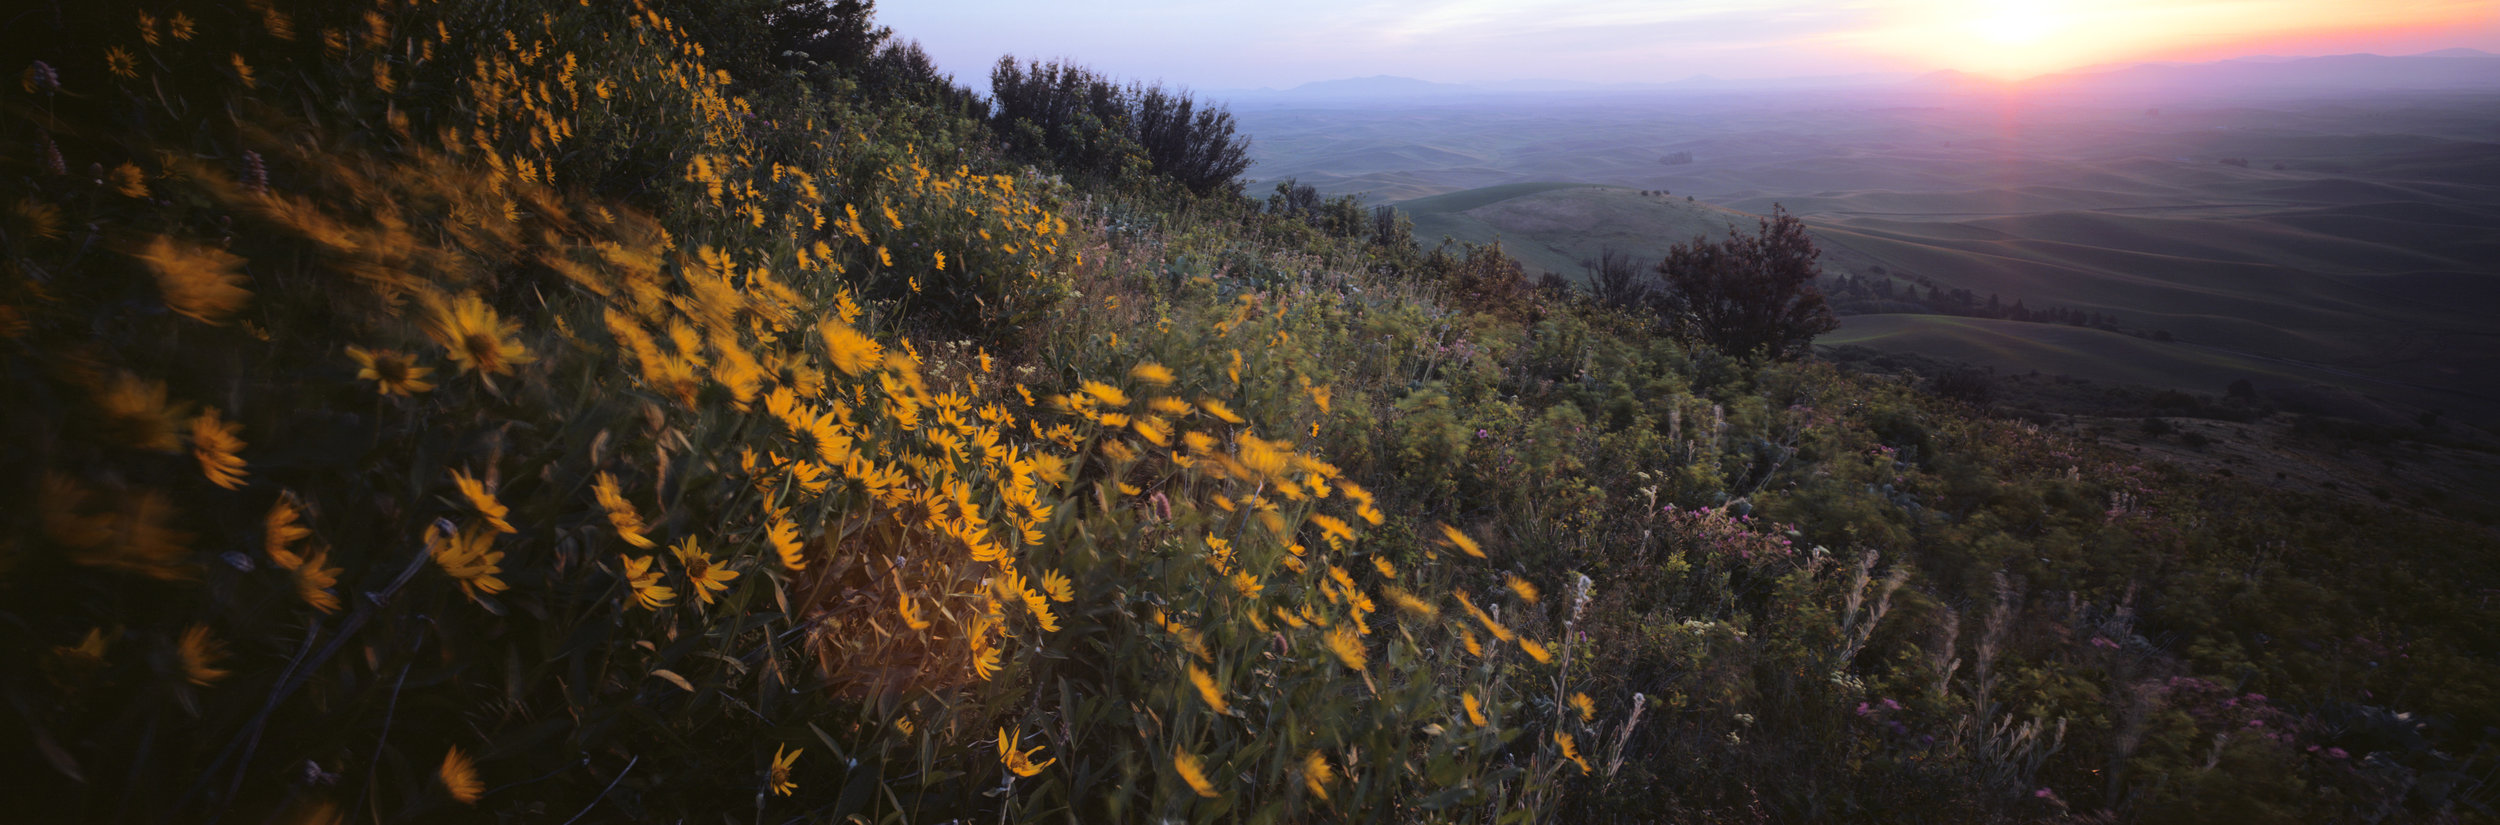 Steptoe Butte at sunrise. Ektar 100, 1/2 sec, f/35.